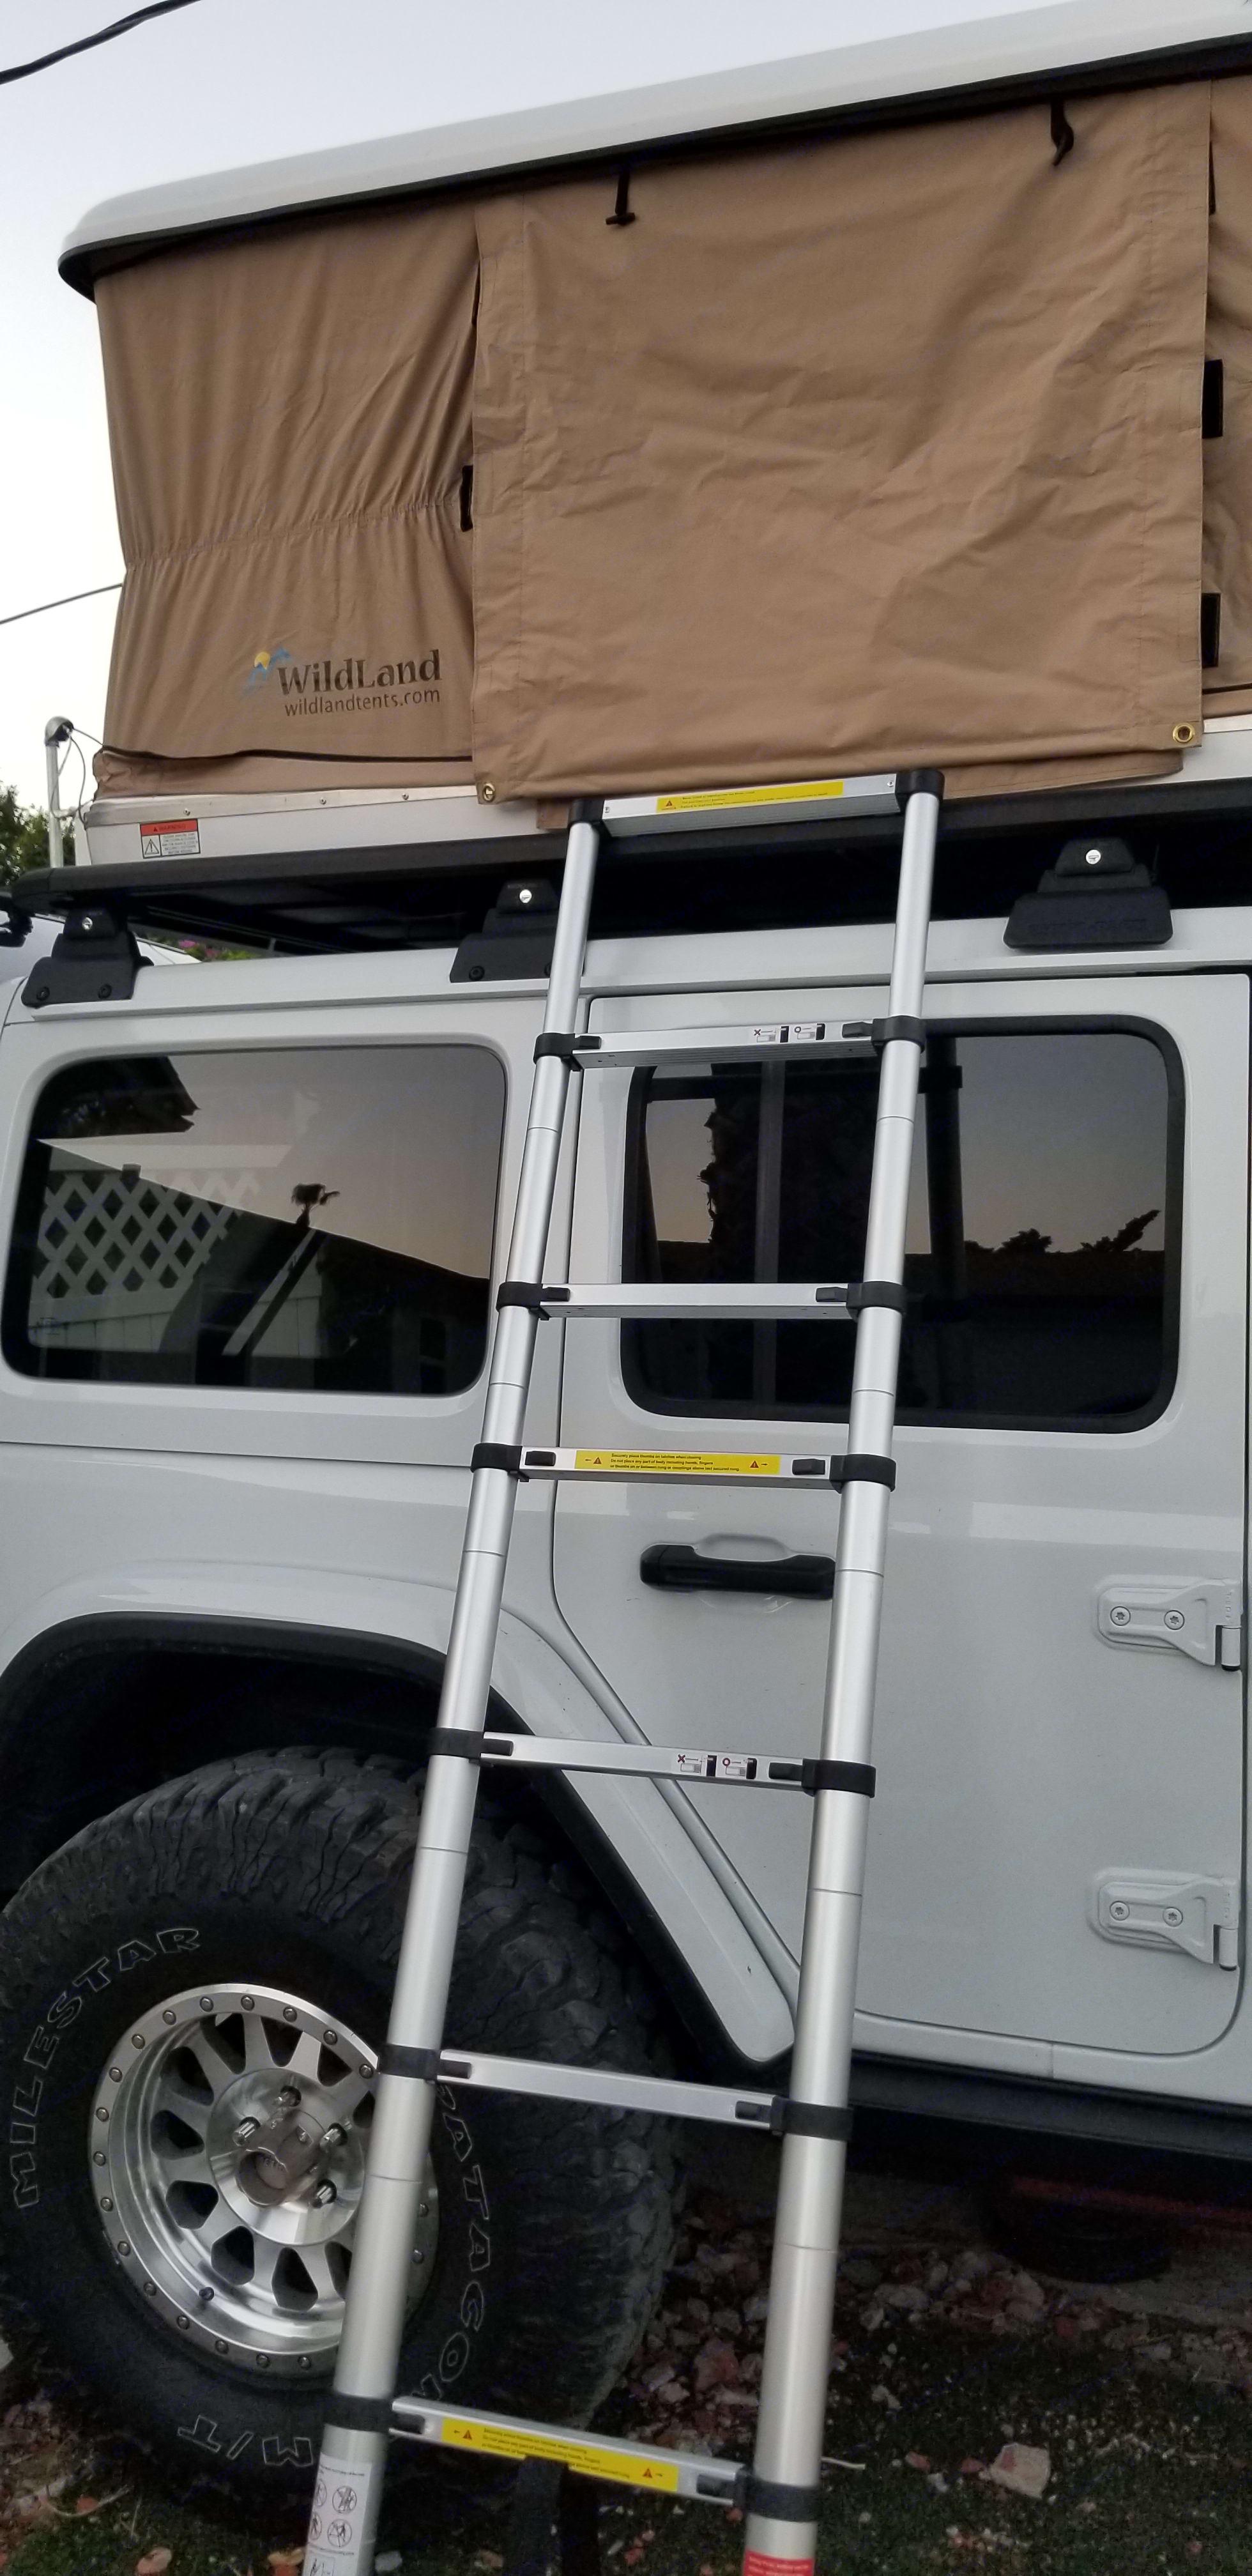 Jeep Wrangler JLU Rubicon 2018